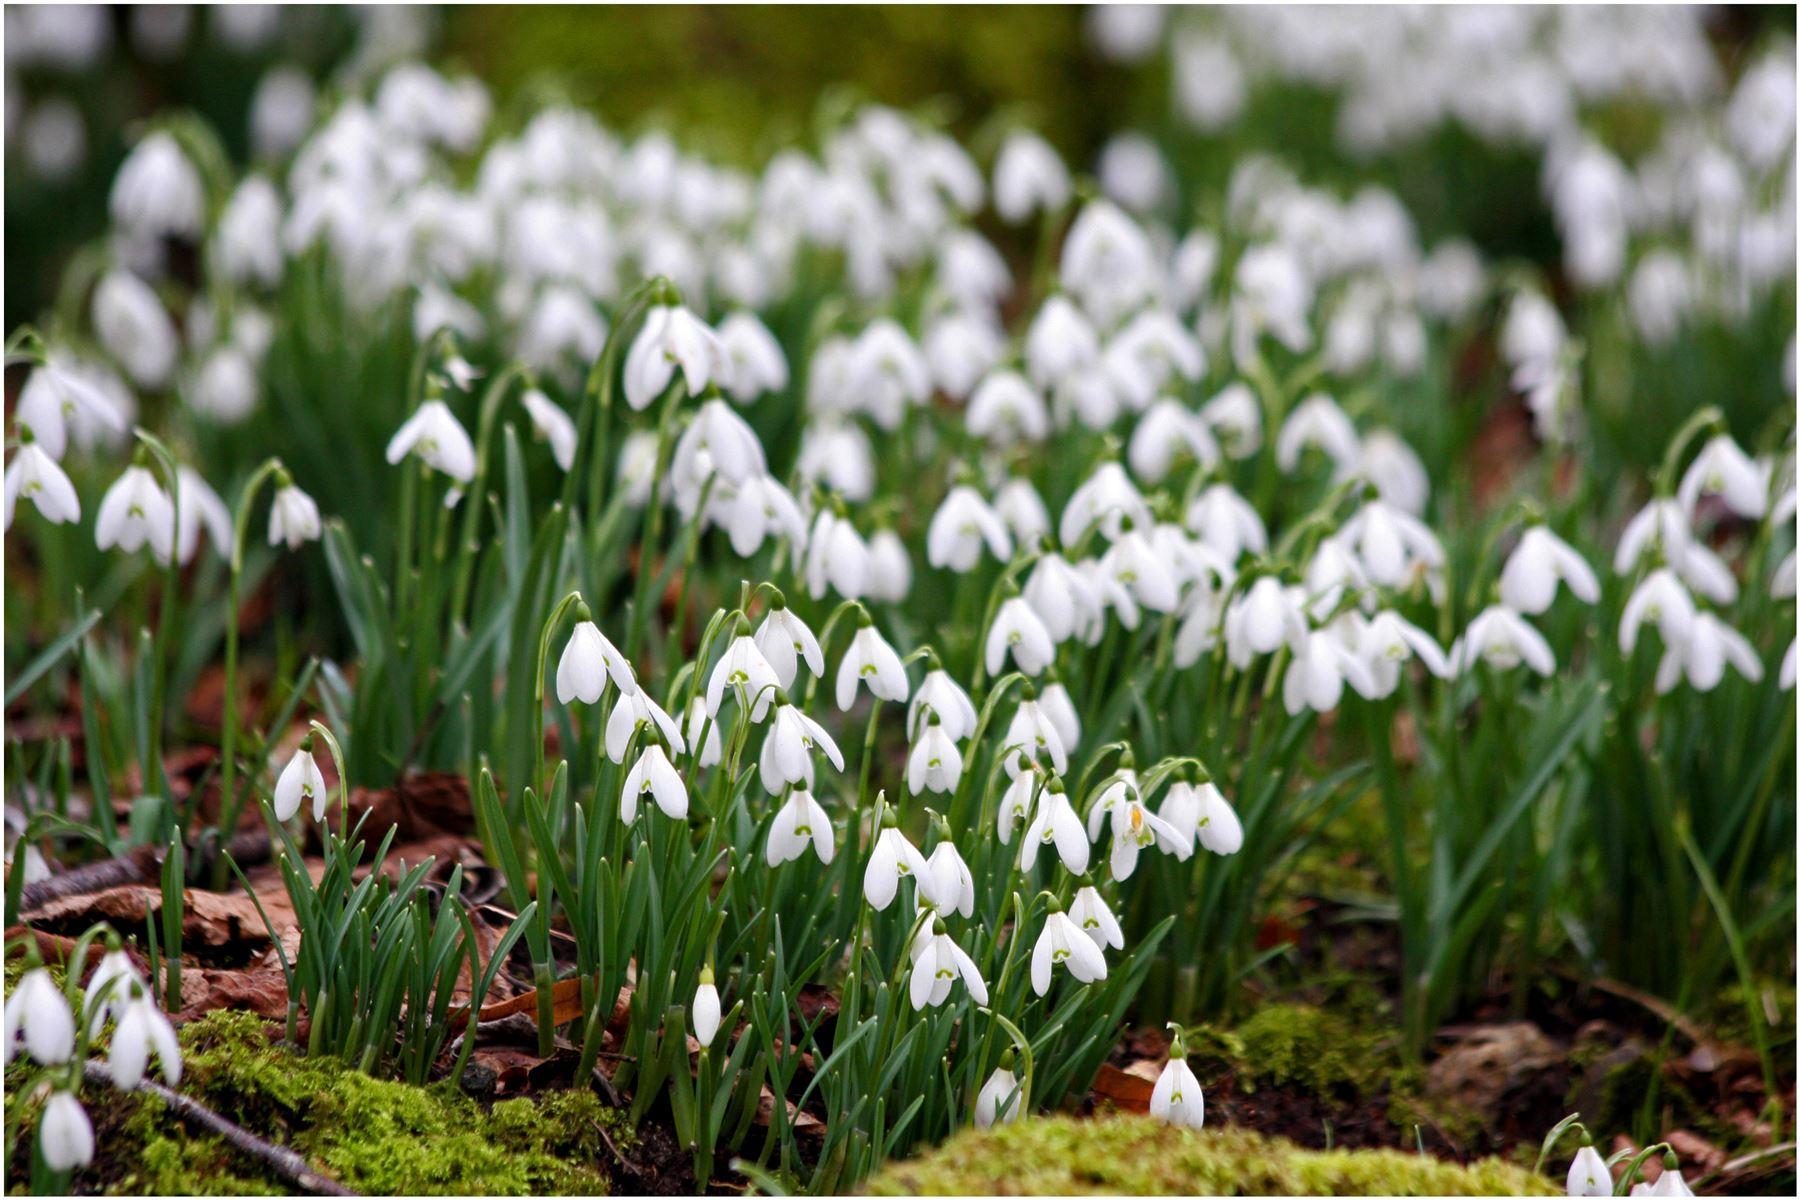 10 15 Snowdrop Galanthus Autumn Bulb Corm Growing Gardening Spring